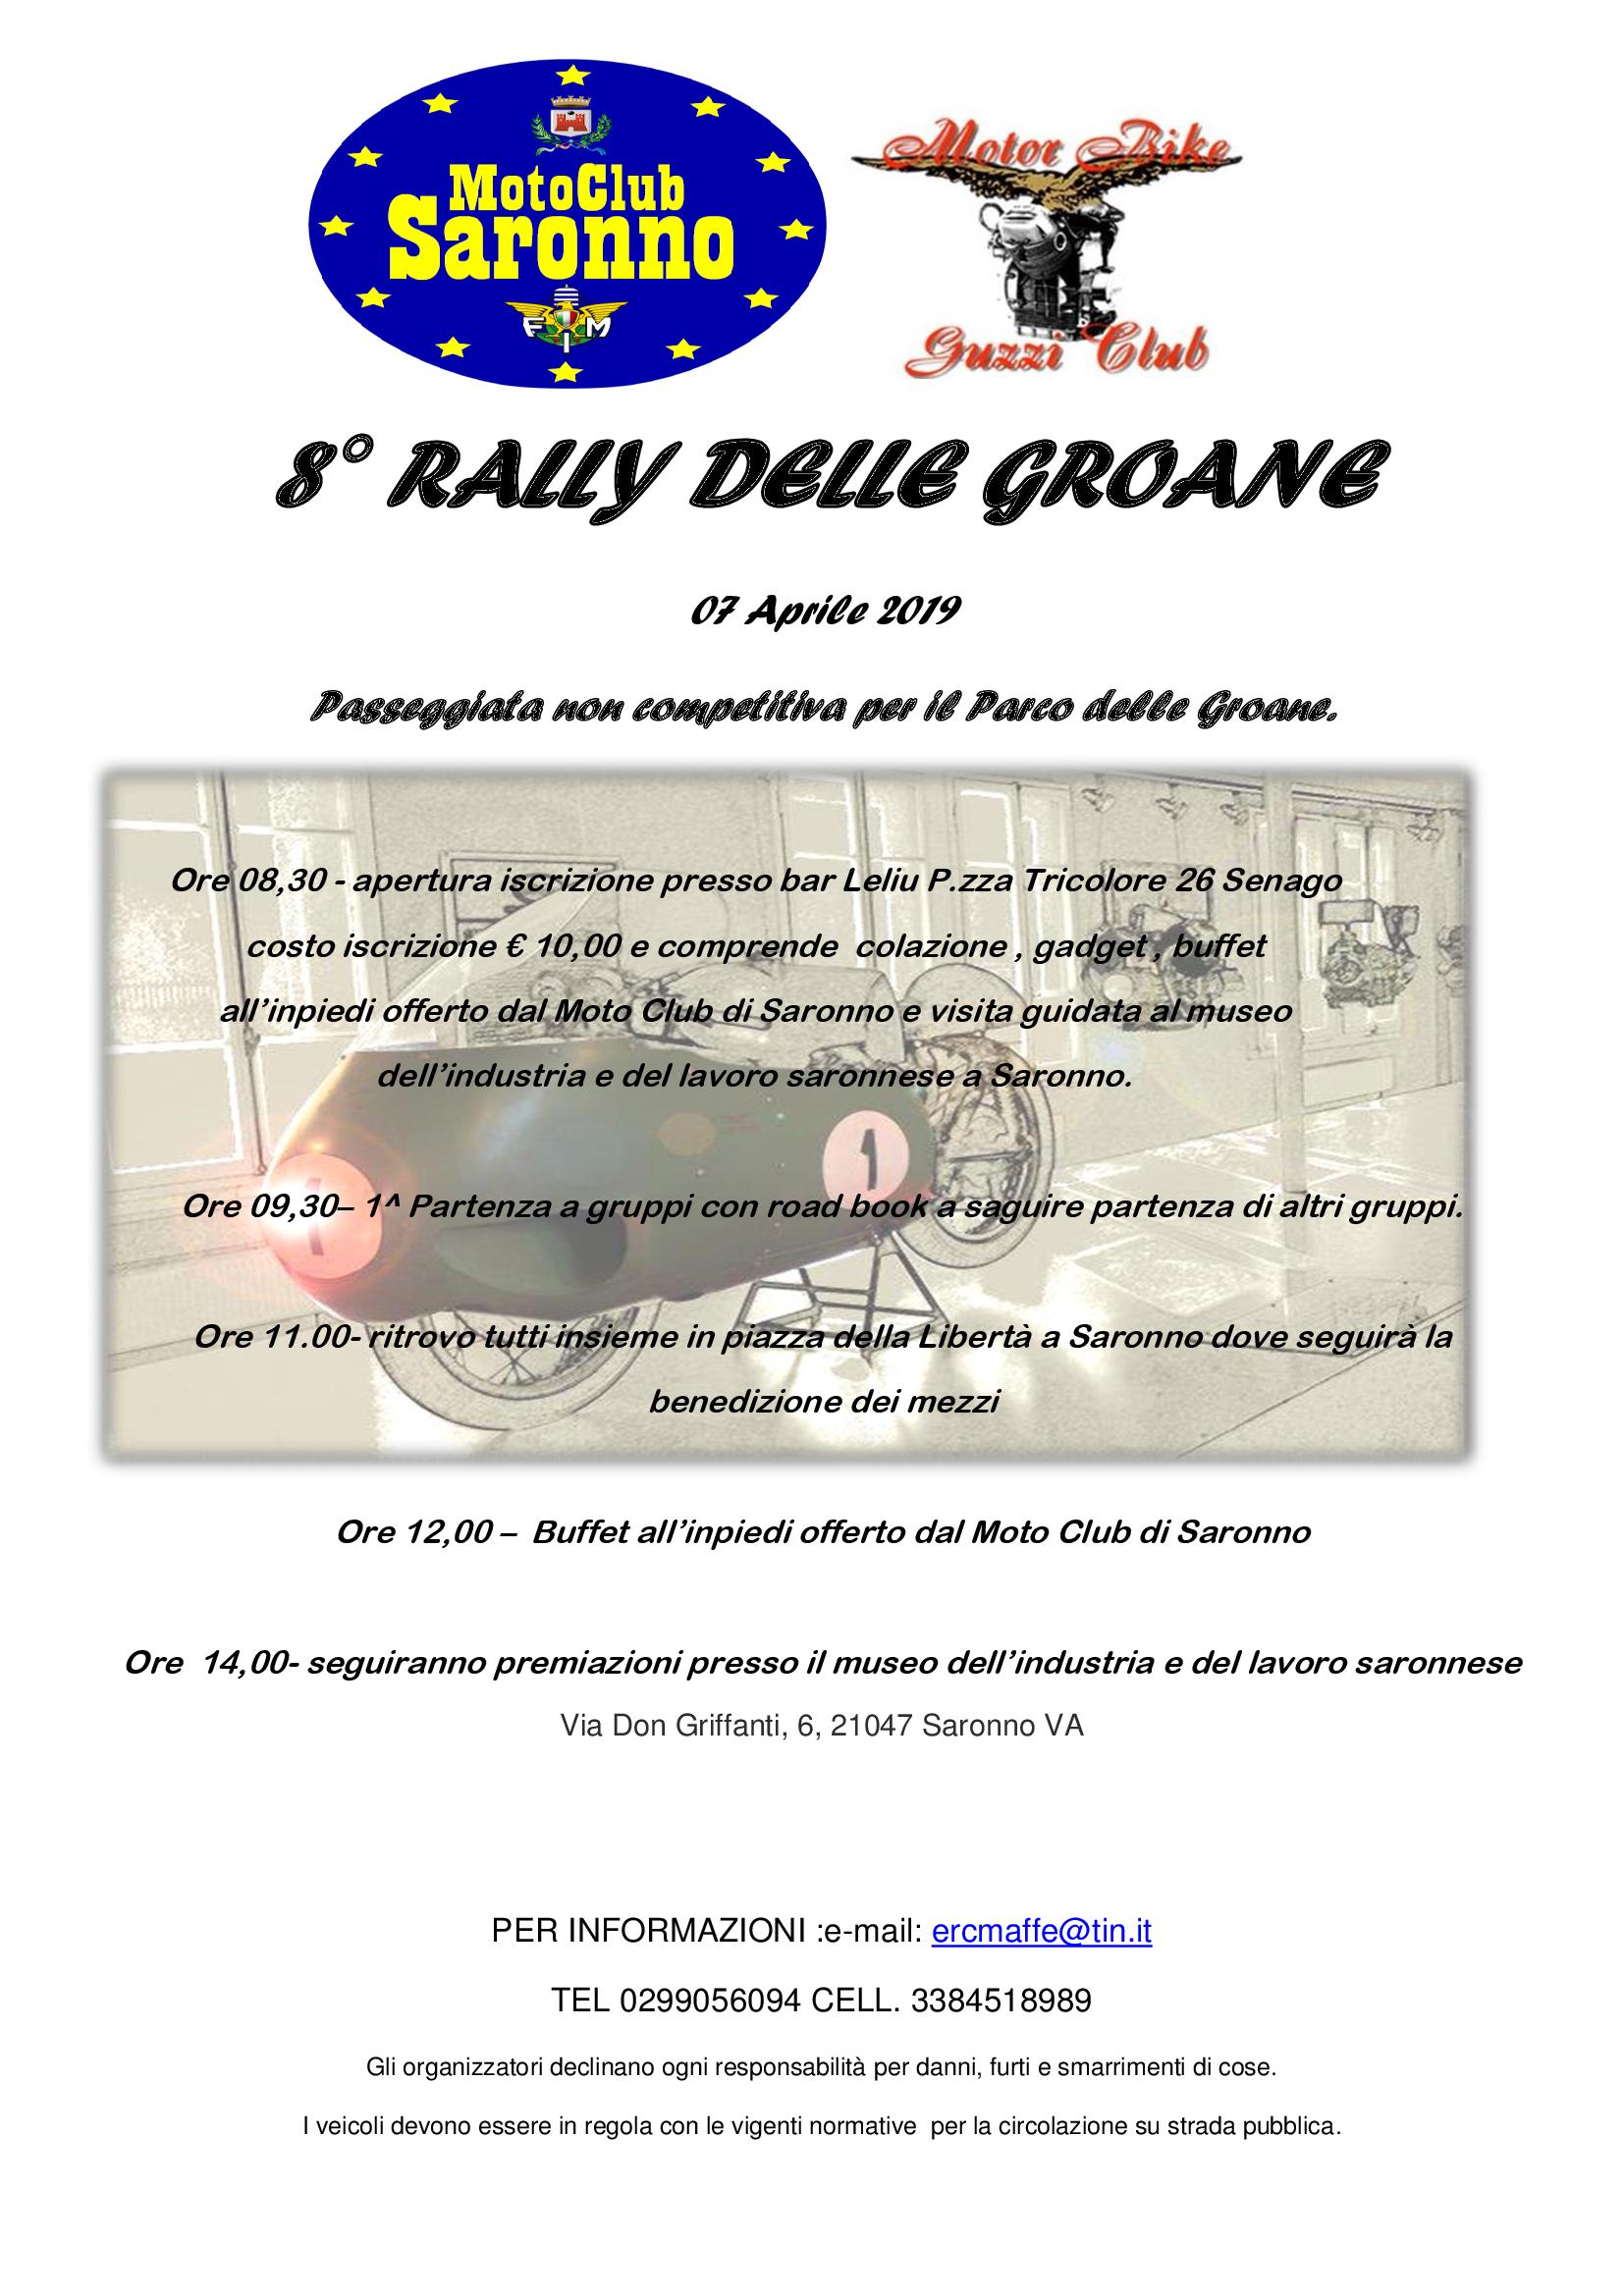 volantino-RADUNO-2019-GROANE-giusto-2019-sponsor-Saronno